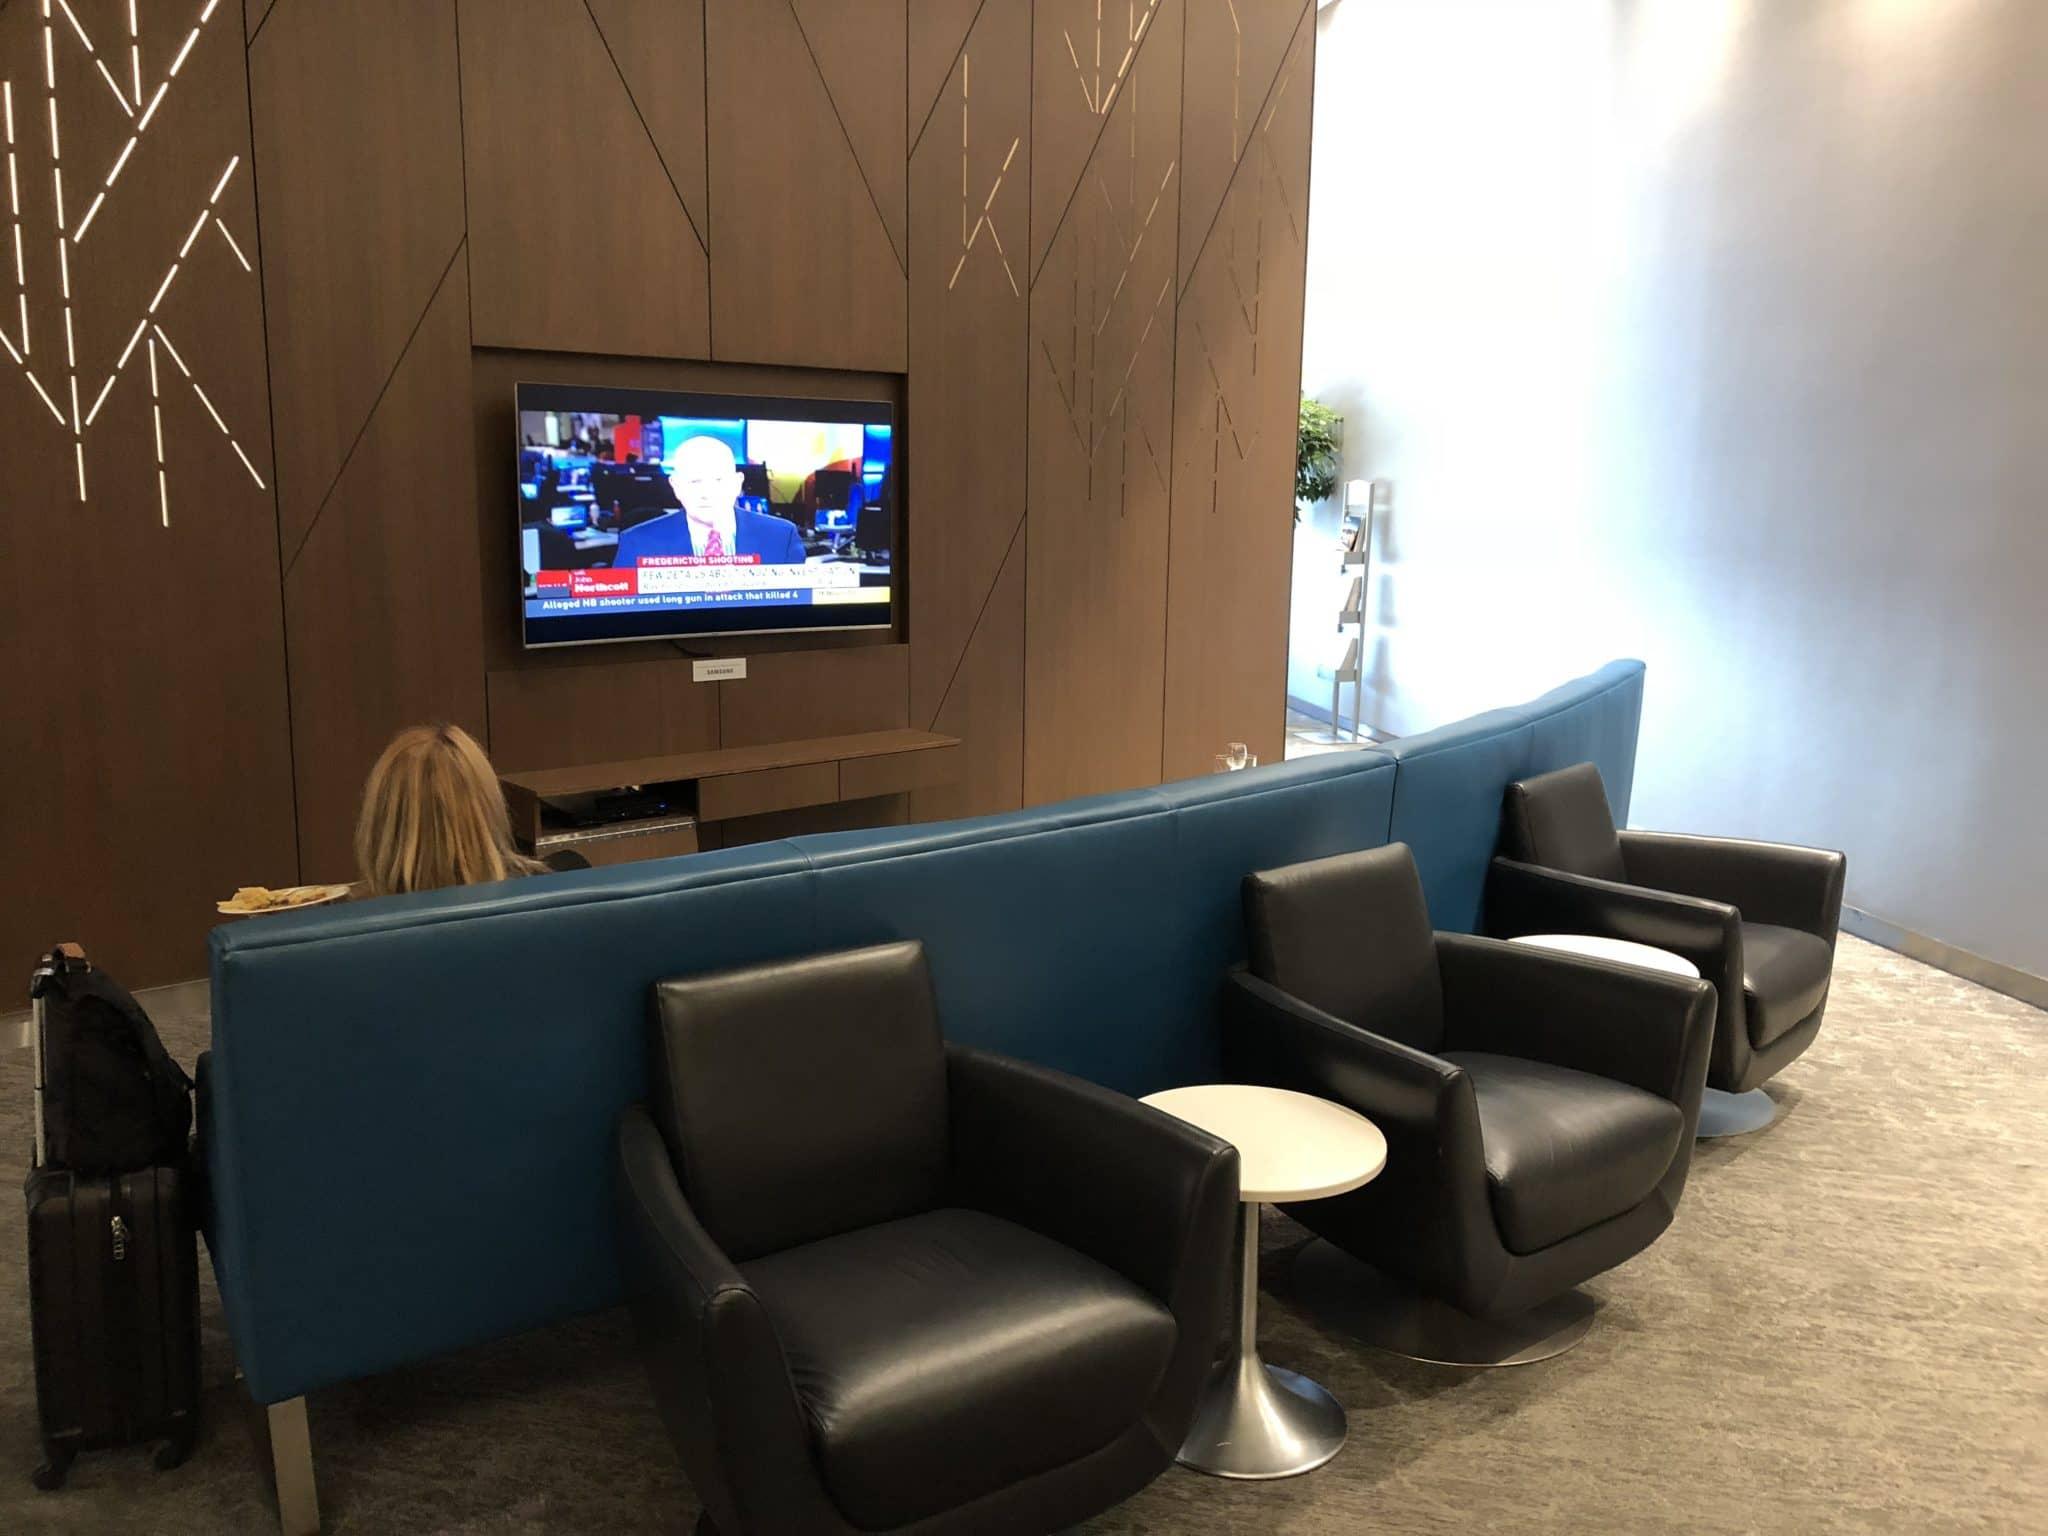 Air Canada Maple Leaf Lounge Calgary Sofa mit TV